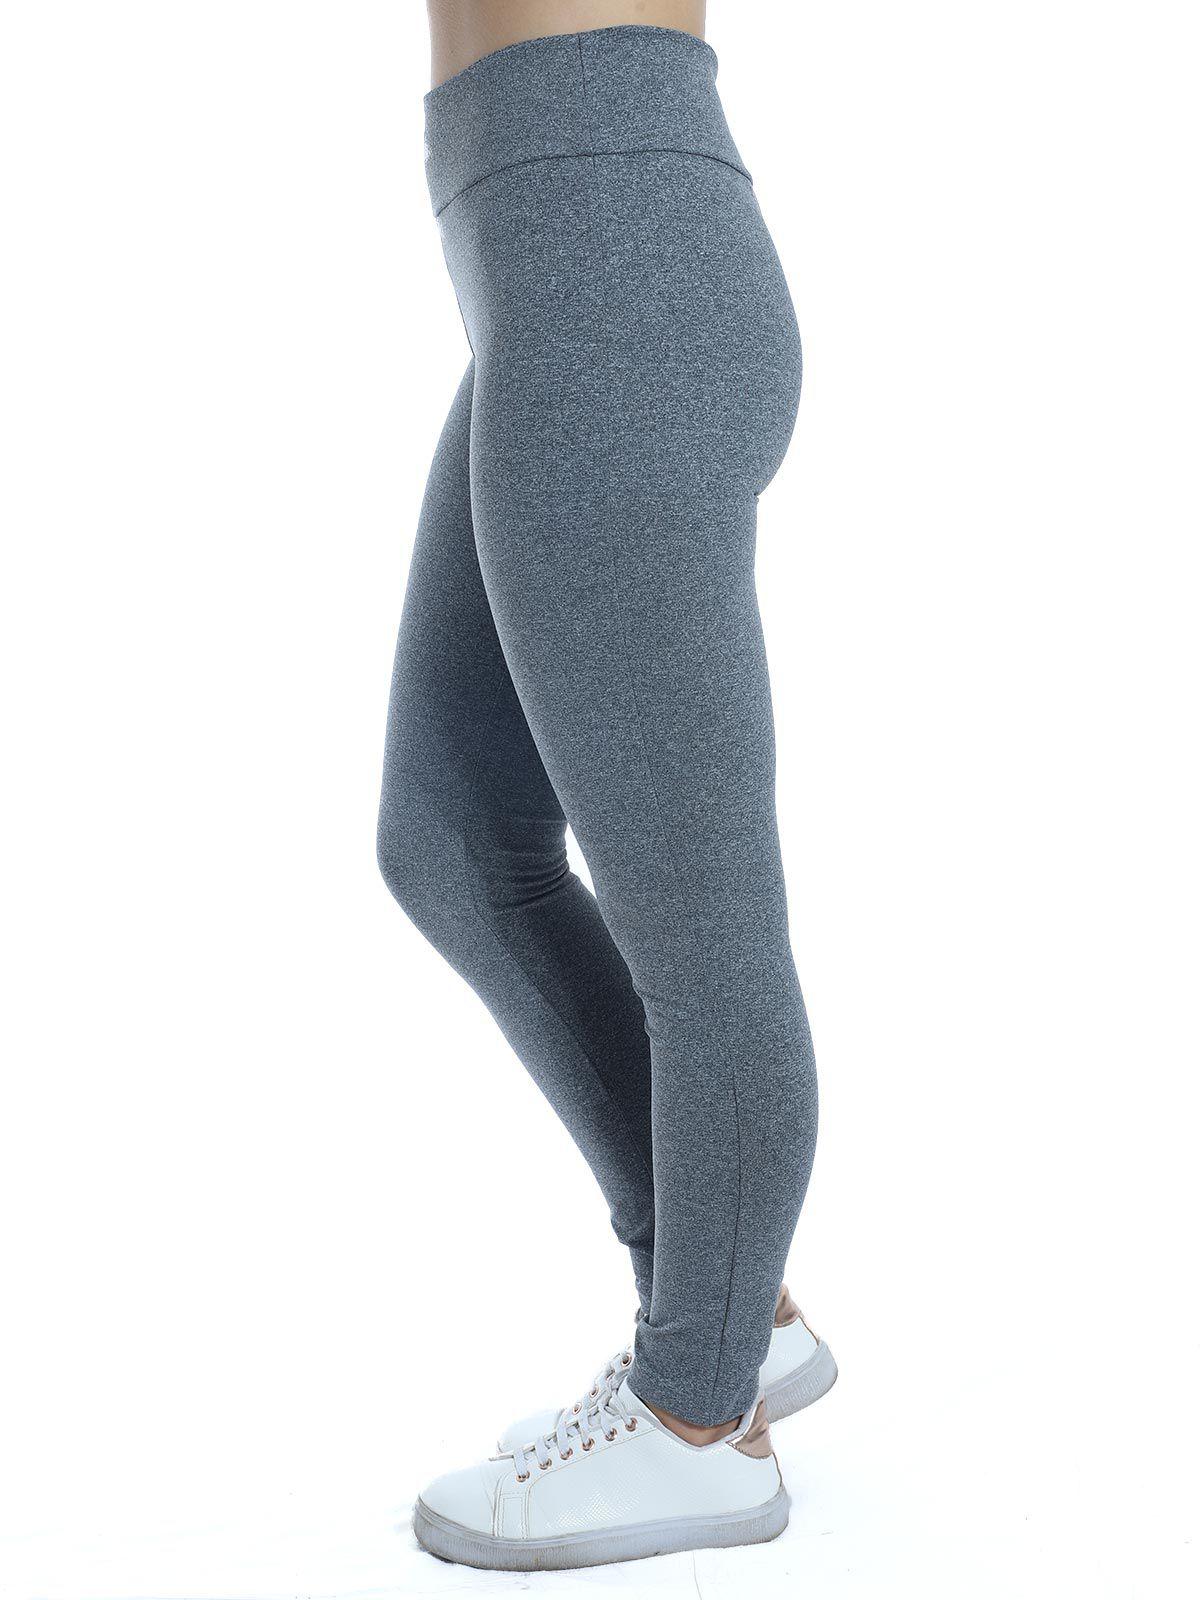 Calça Fusô Cós Anatômico Fitness Anistia Mescla